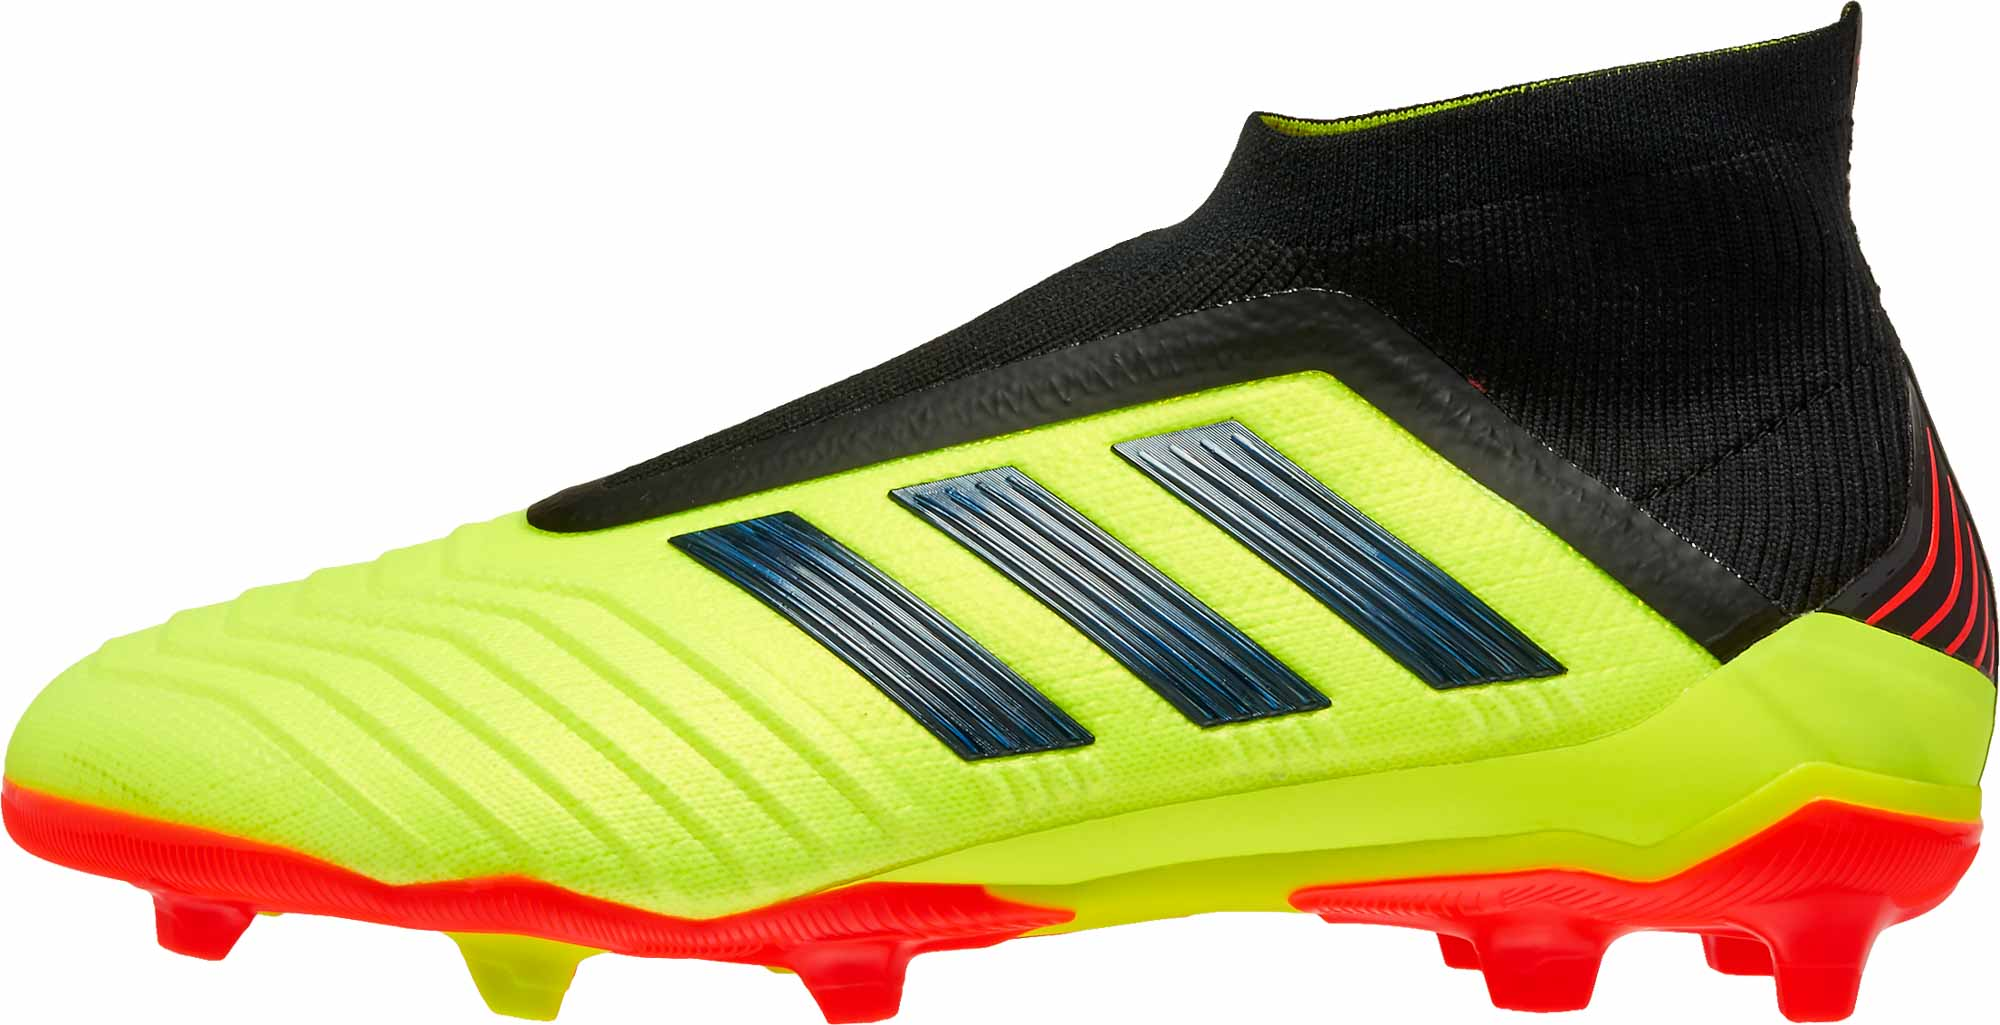 adidas Predator 18 FG - Youth - Solar Yellow Black Solar Red - SoccerPro cb67eea8d5b4